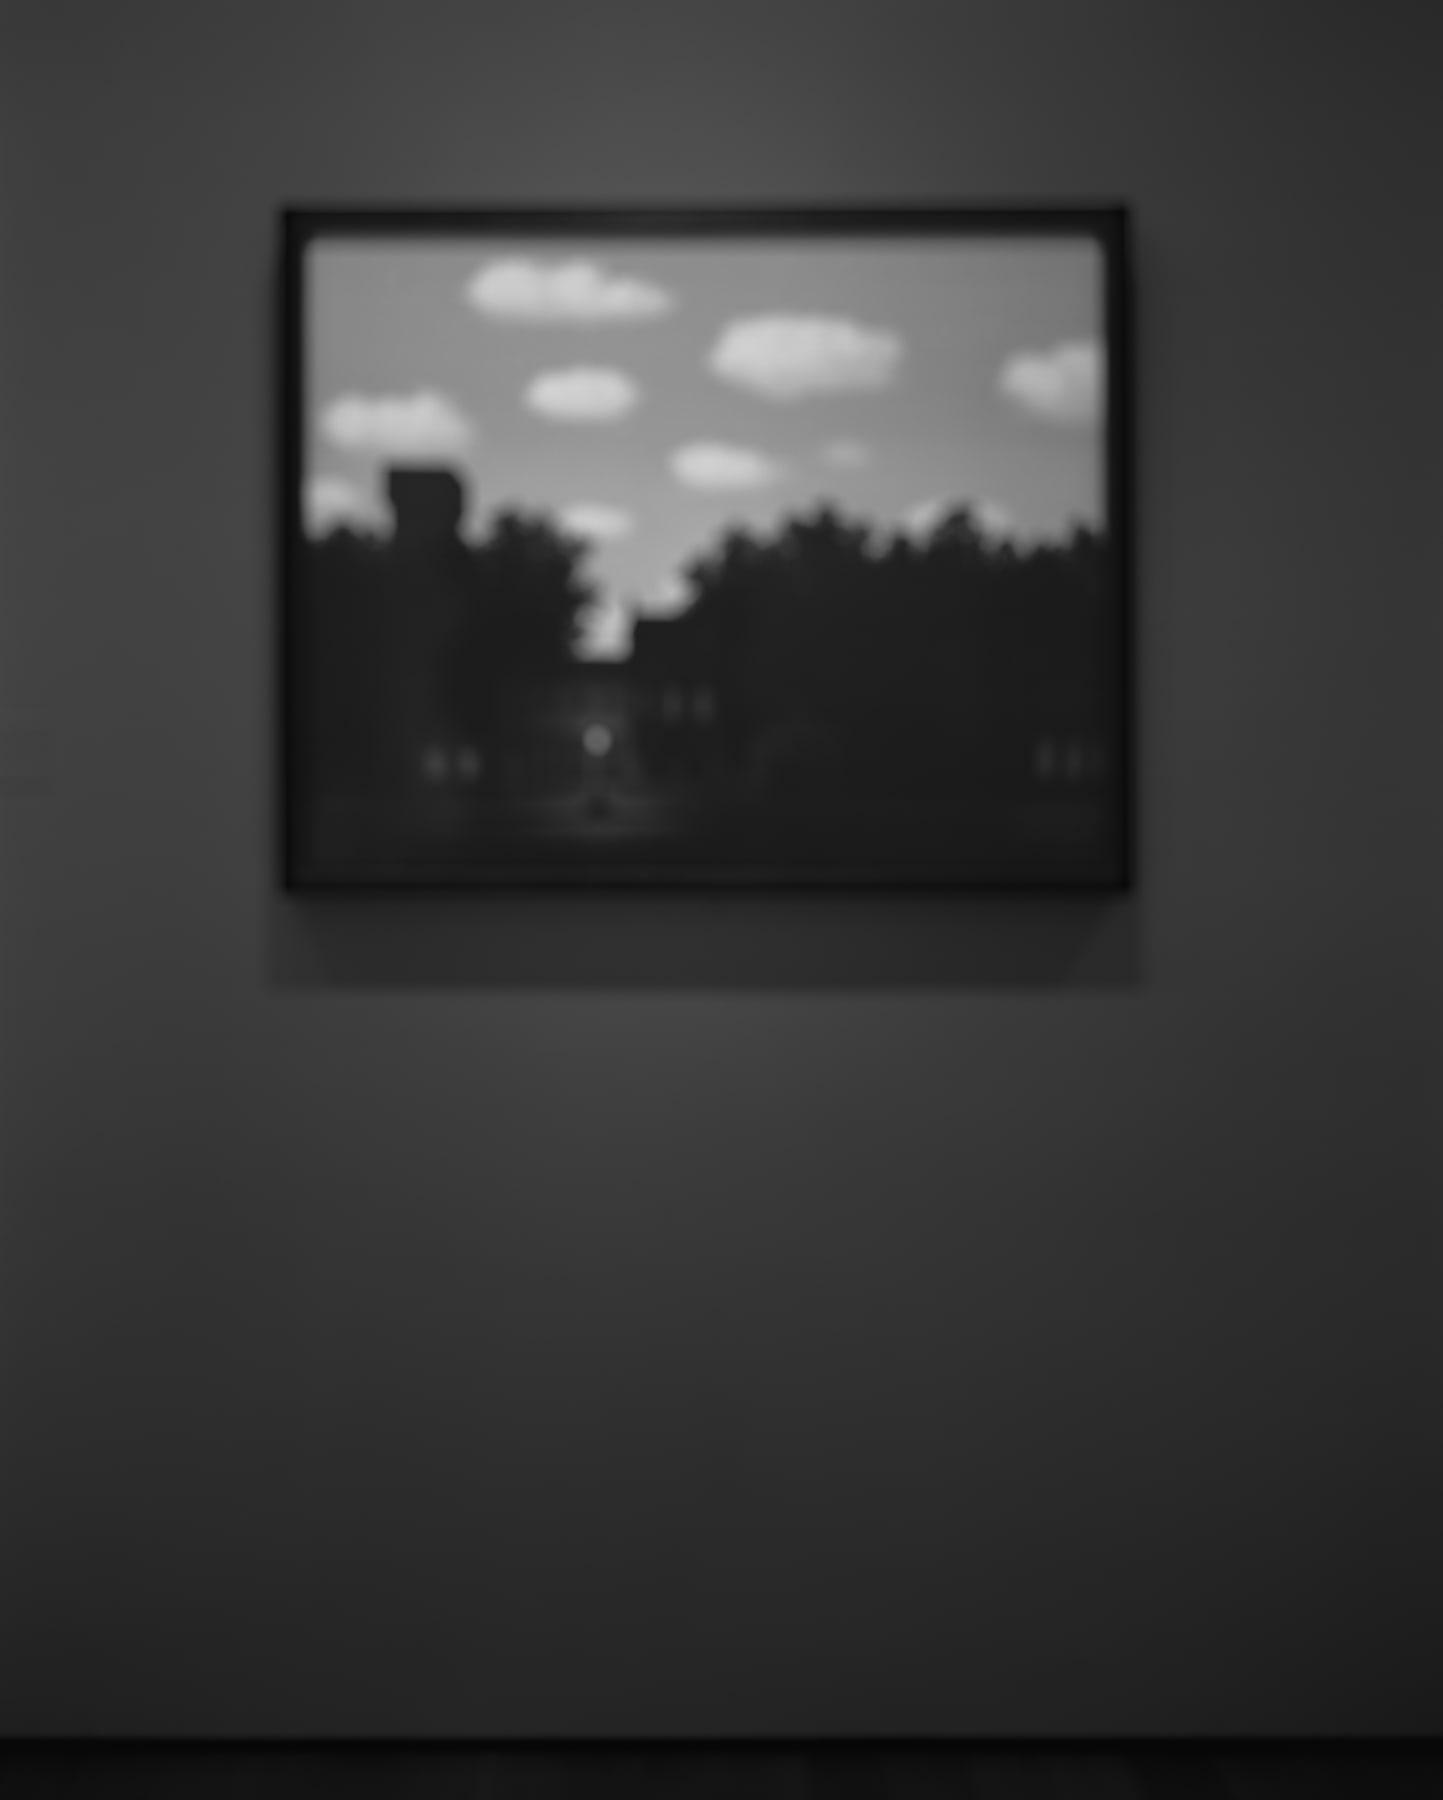 Hiroshi Sugimoto, Past Presence 057, The Empire of Light II, René Magritte, 2014